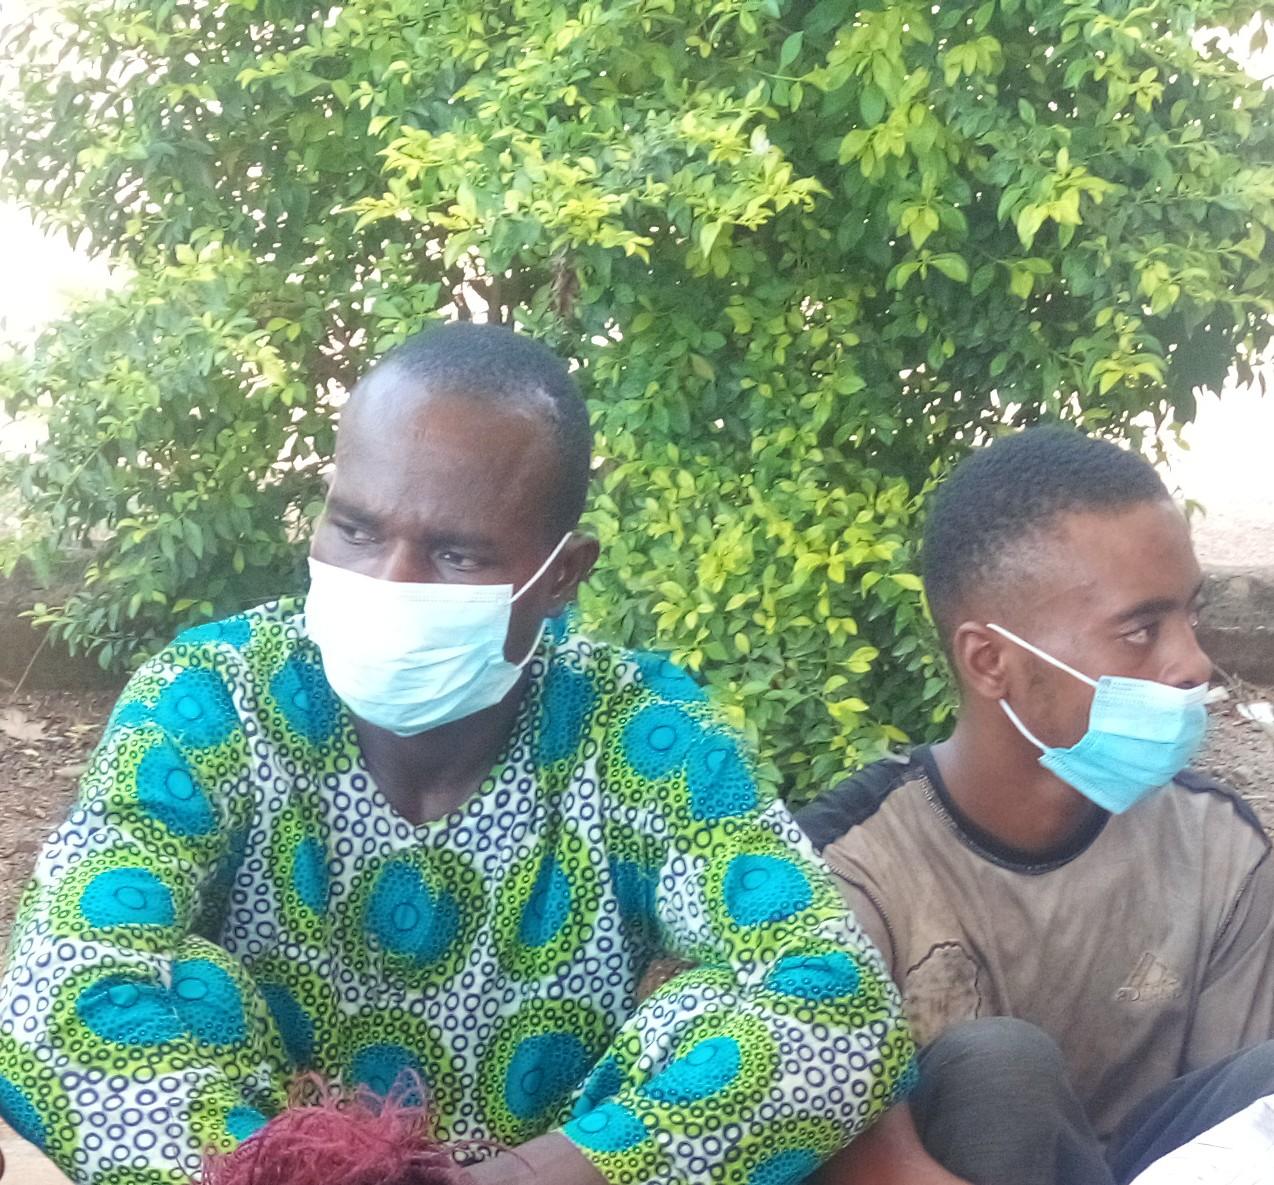 Houseboy Machetes Madam To Death While Asleep — Ondo Police